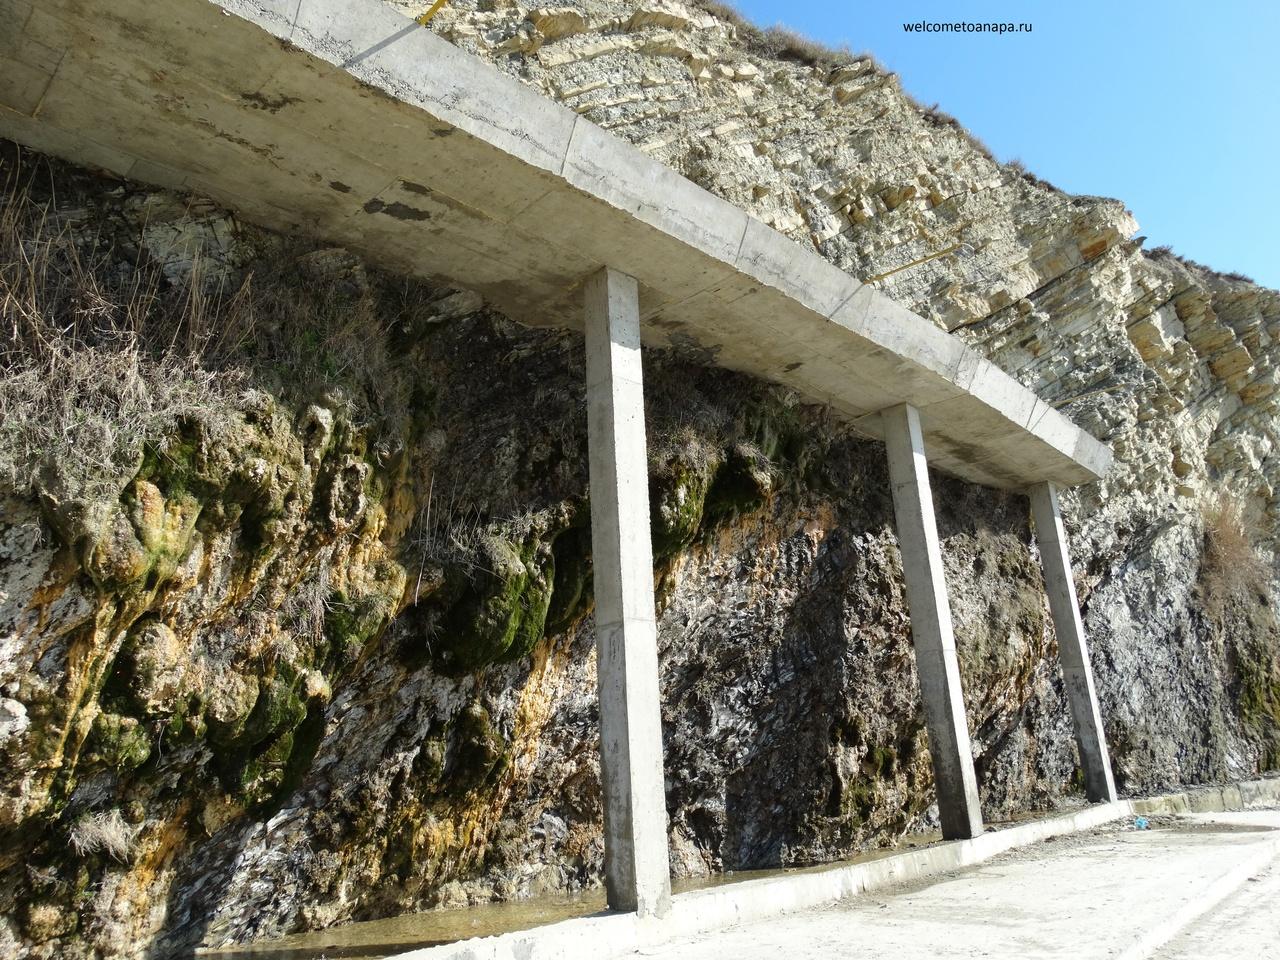 Анапа, Анапа высокий берег,высокий берег в Анапе,Анапа безопасные места отдыха 2016,